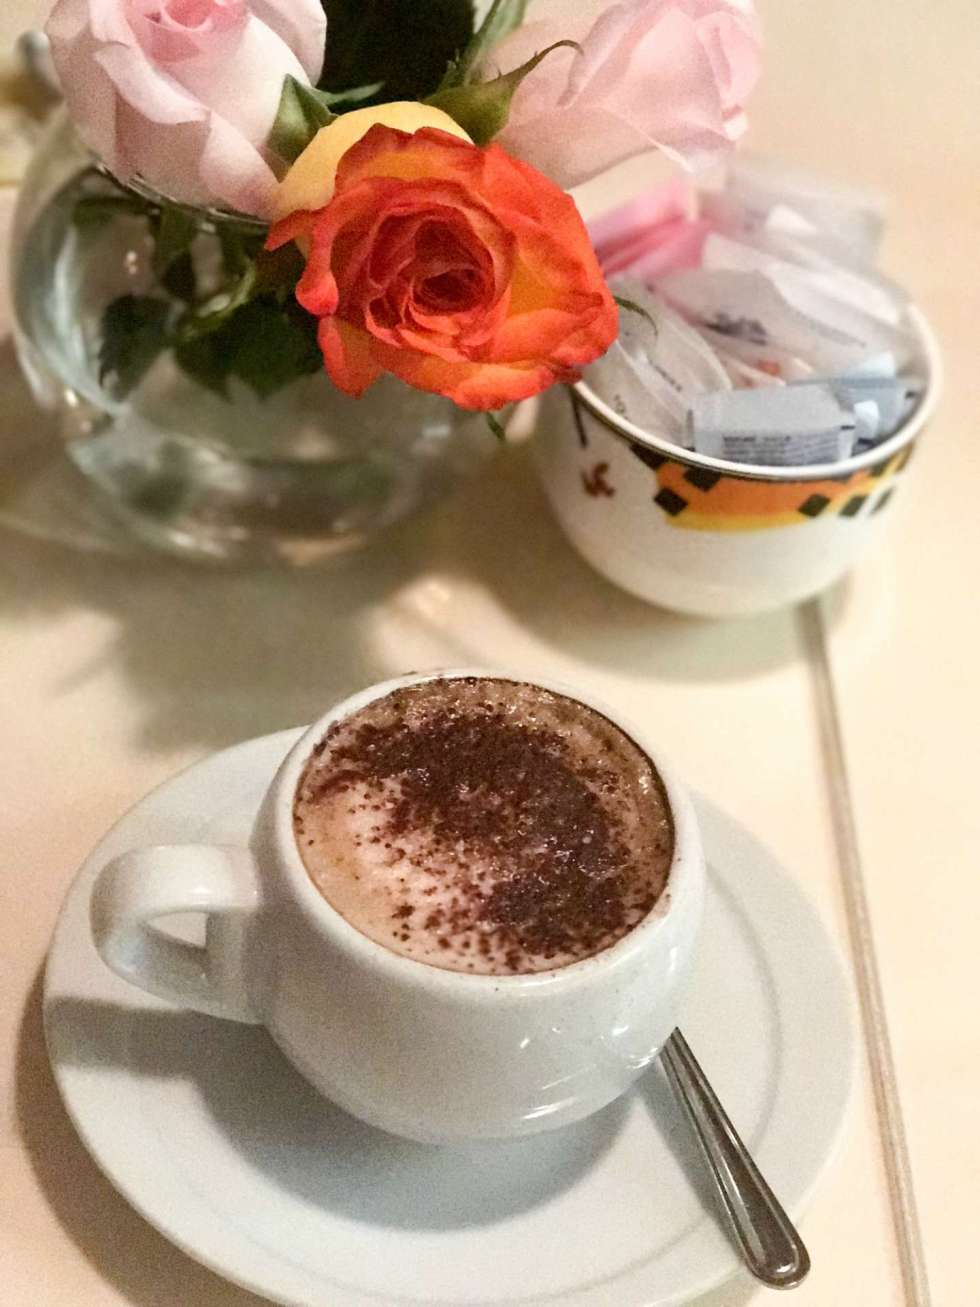 Coffee Talk: April Edition - I'm Fixin' To - @mbg0112